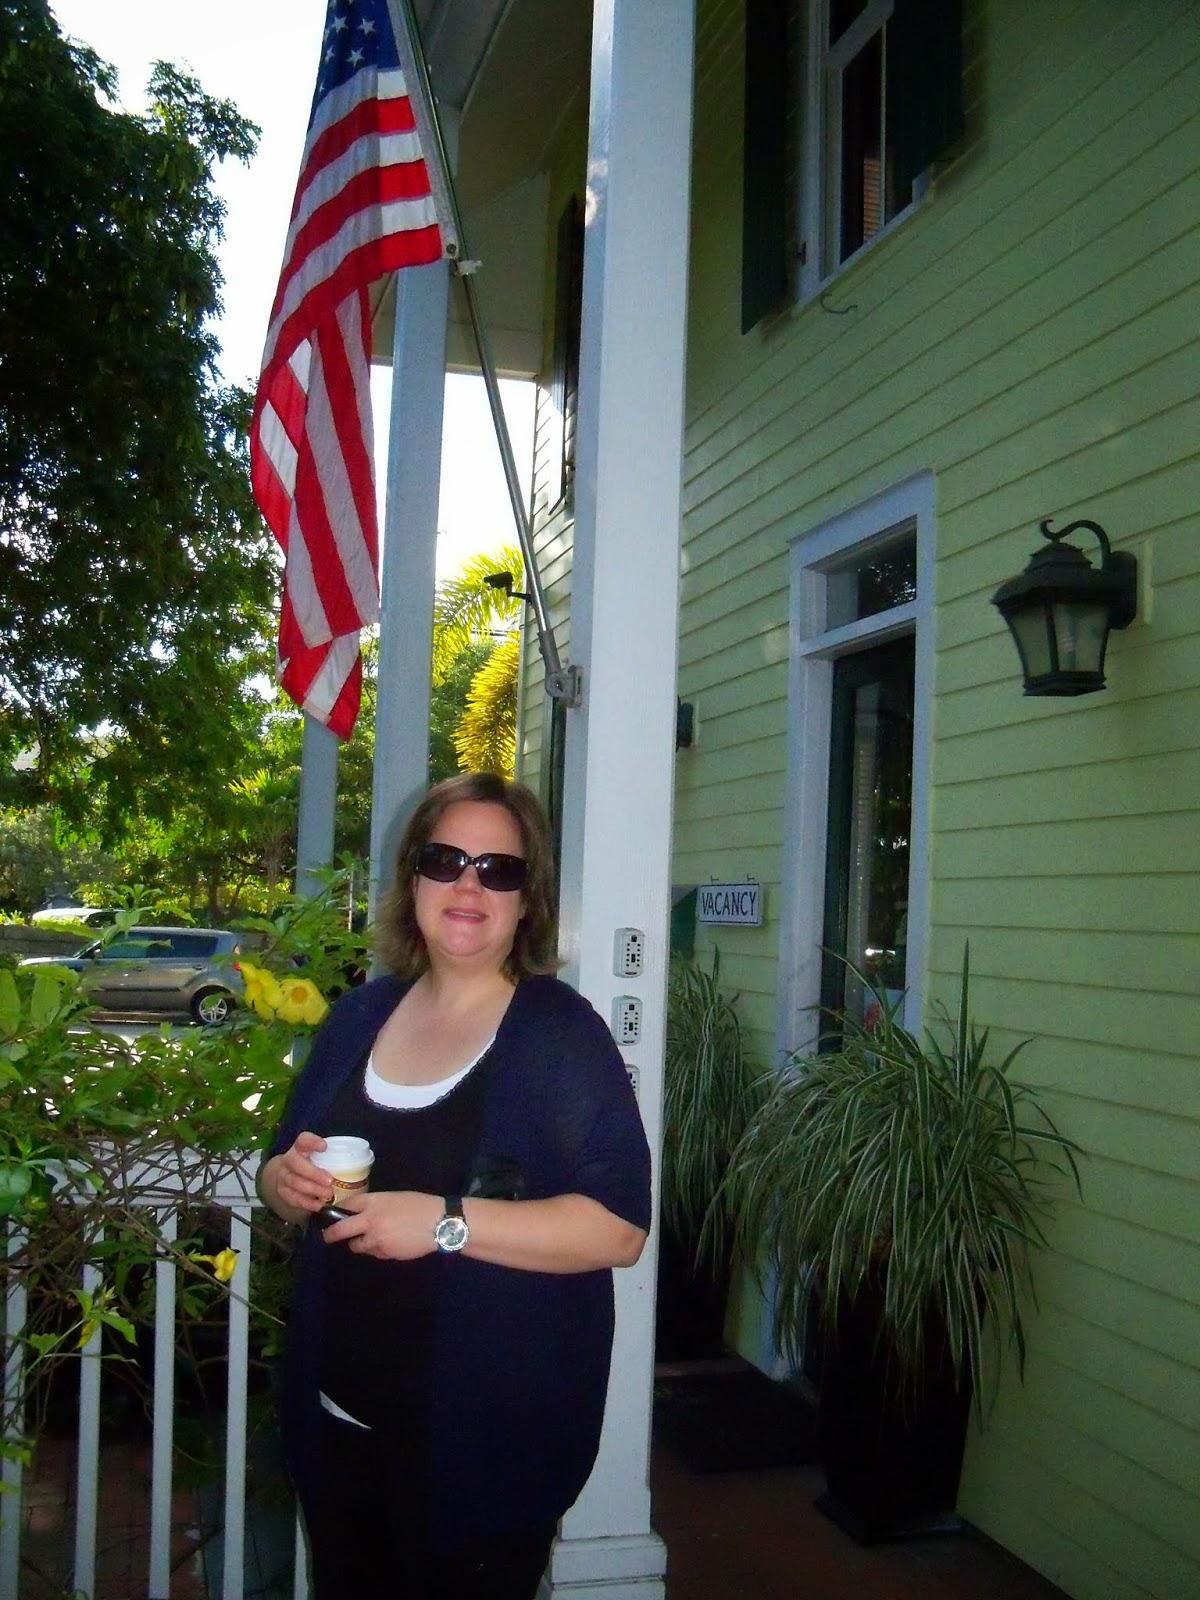 Key West Vacation - 116_5373.JPG